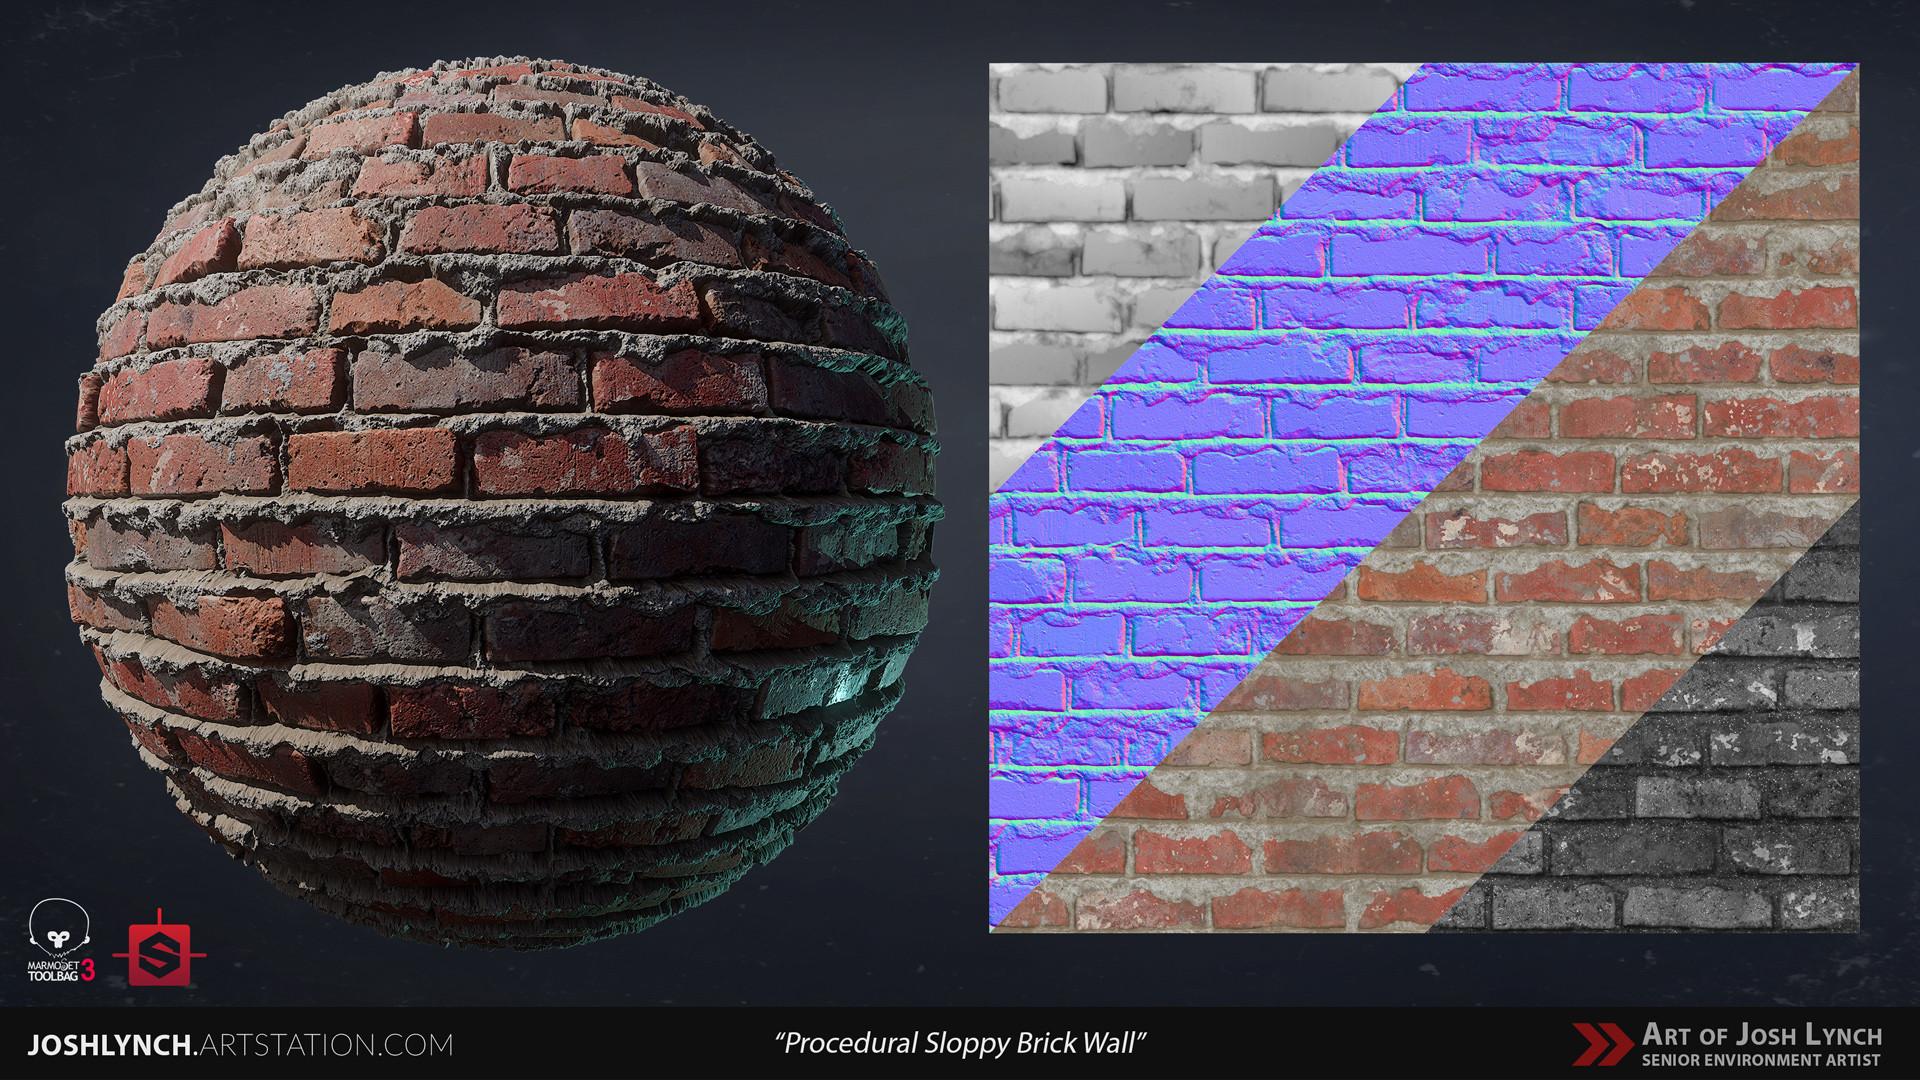 Joshua lynch wall brick sloppy 02 comp sphere 01